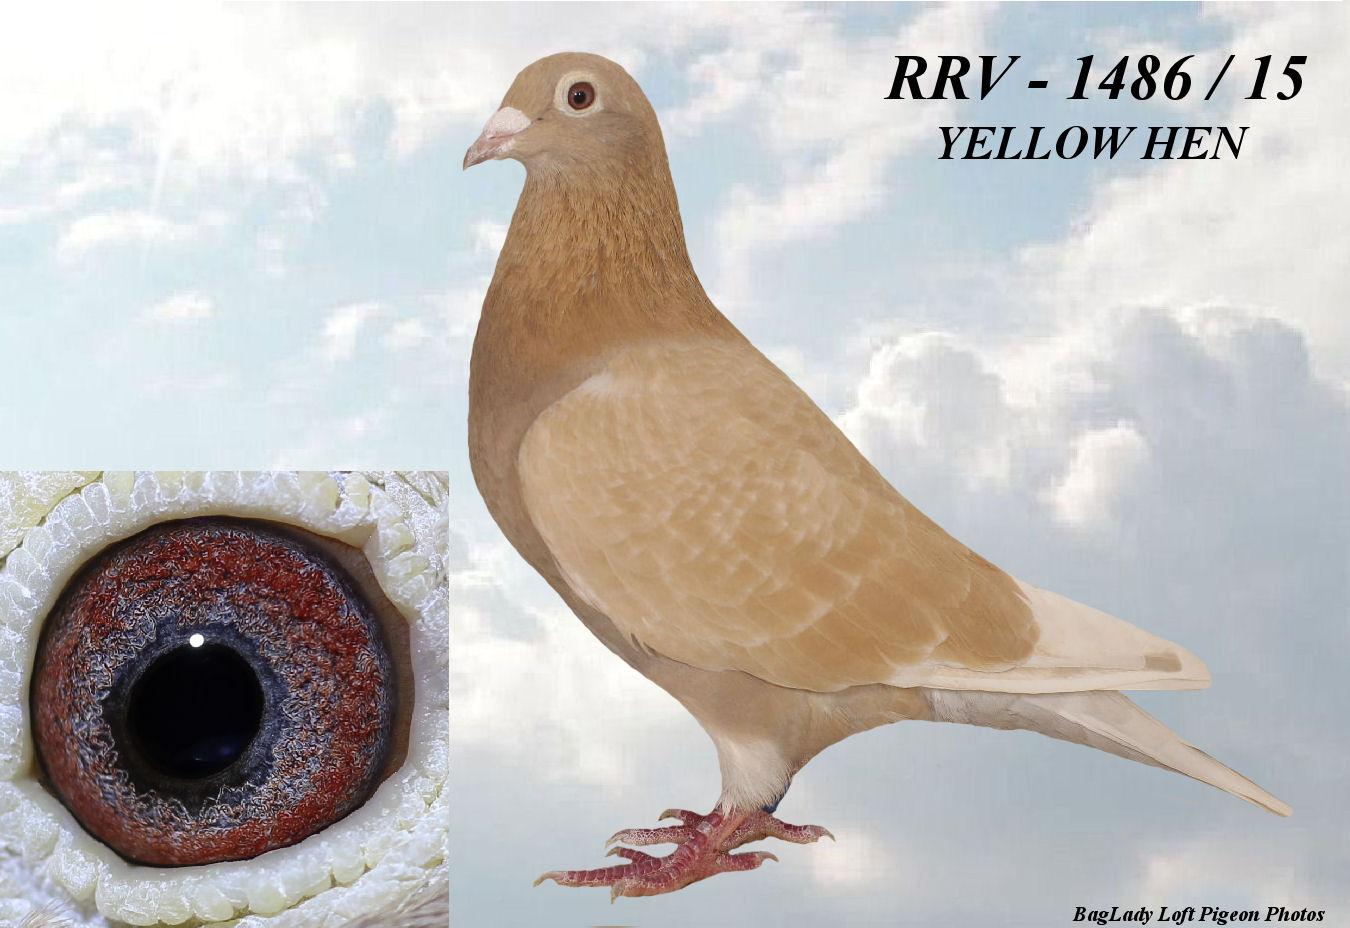 RRV - 1486 /2015  YELLOW HEN